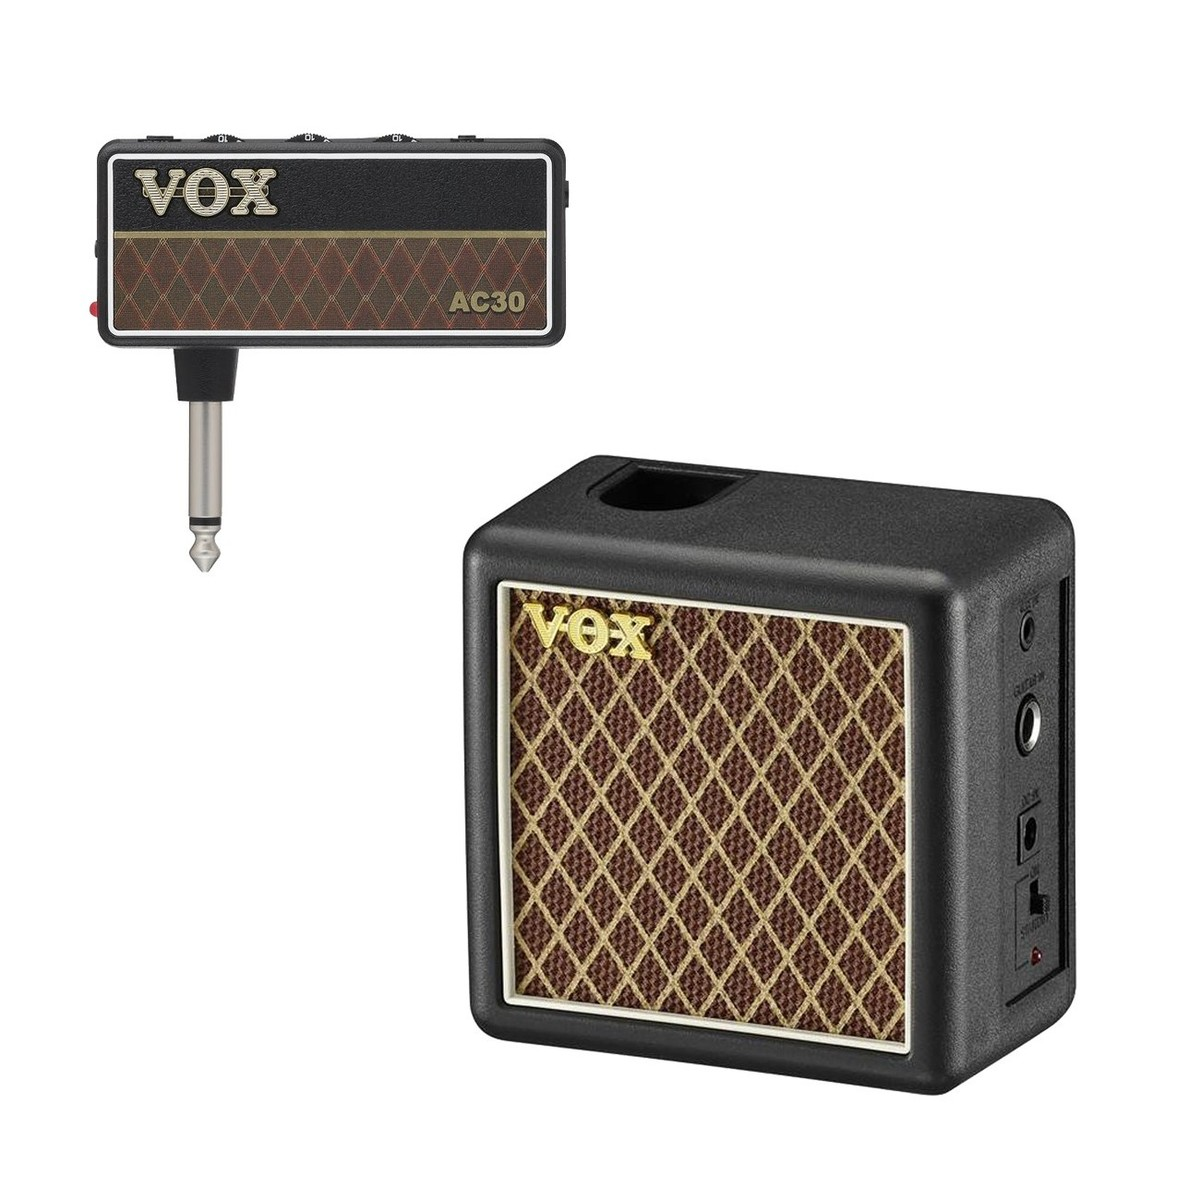 vox amplug 2 ac30 guitar headphone amp bundle at gear4music. Black Bedroom Furniture Sets. Home Design Ideas